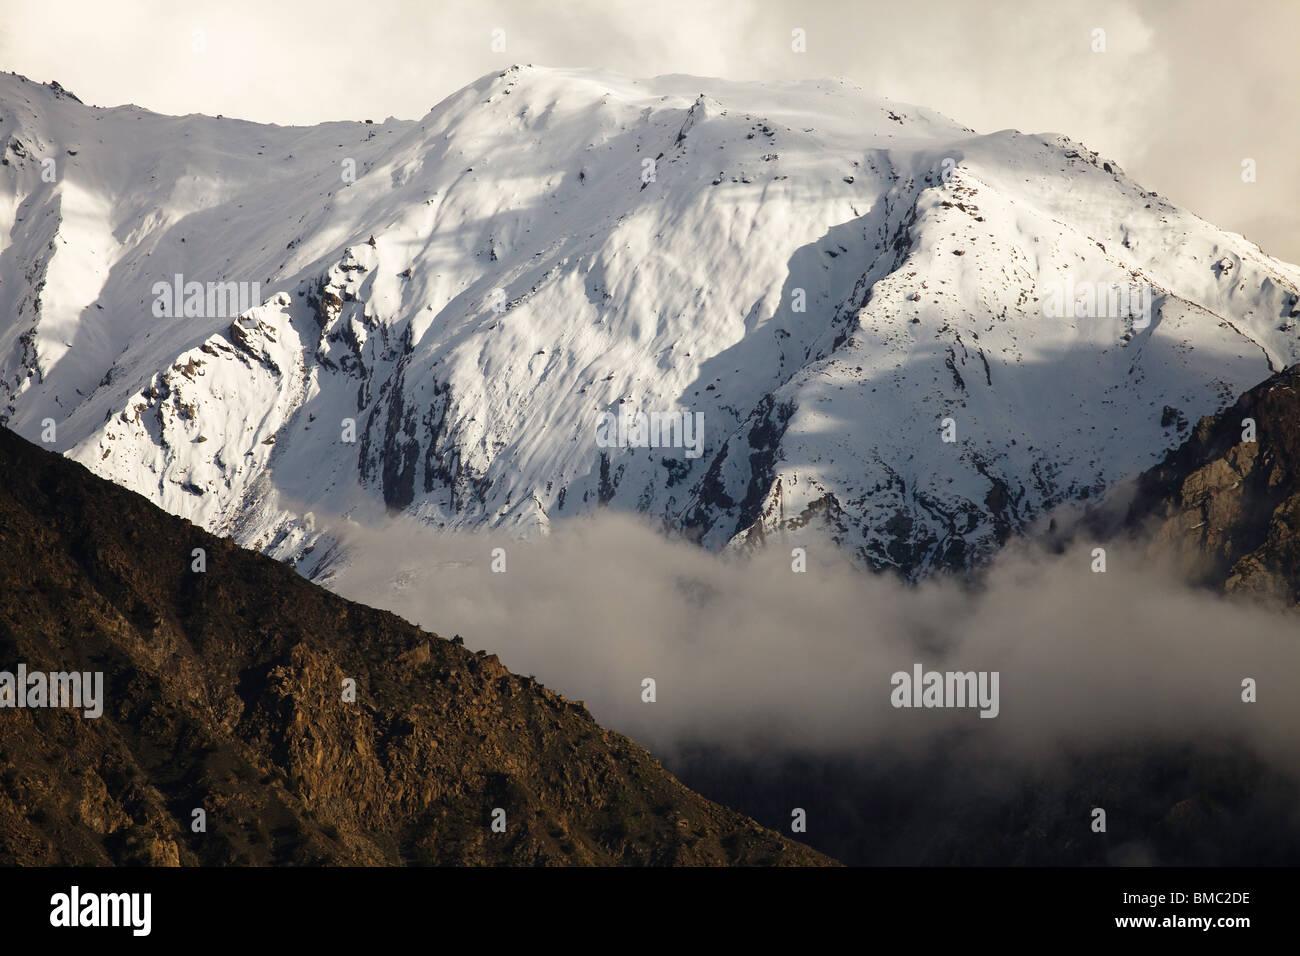 Hindu Kush Scenery along the Karakoram Highway, Pakistan - Stock Image